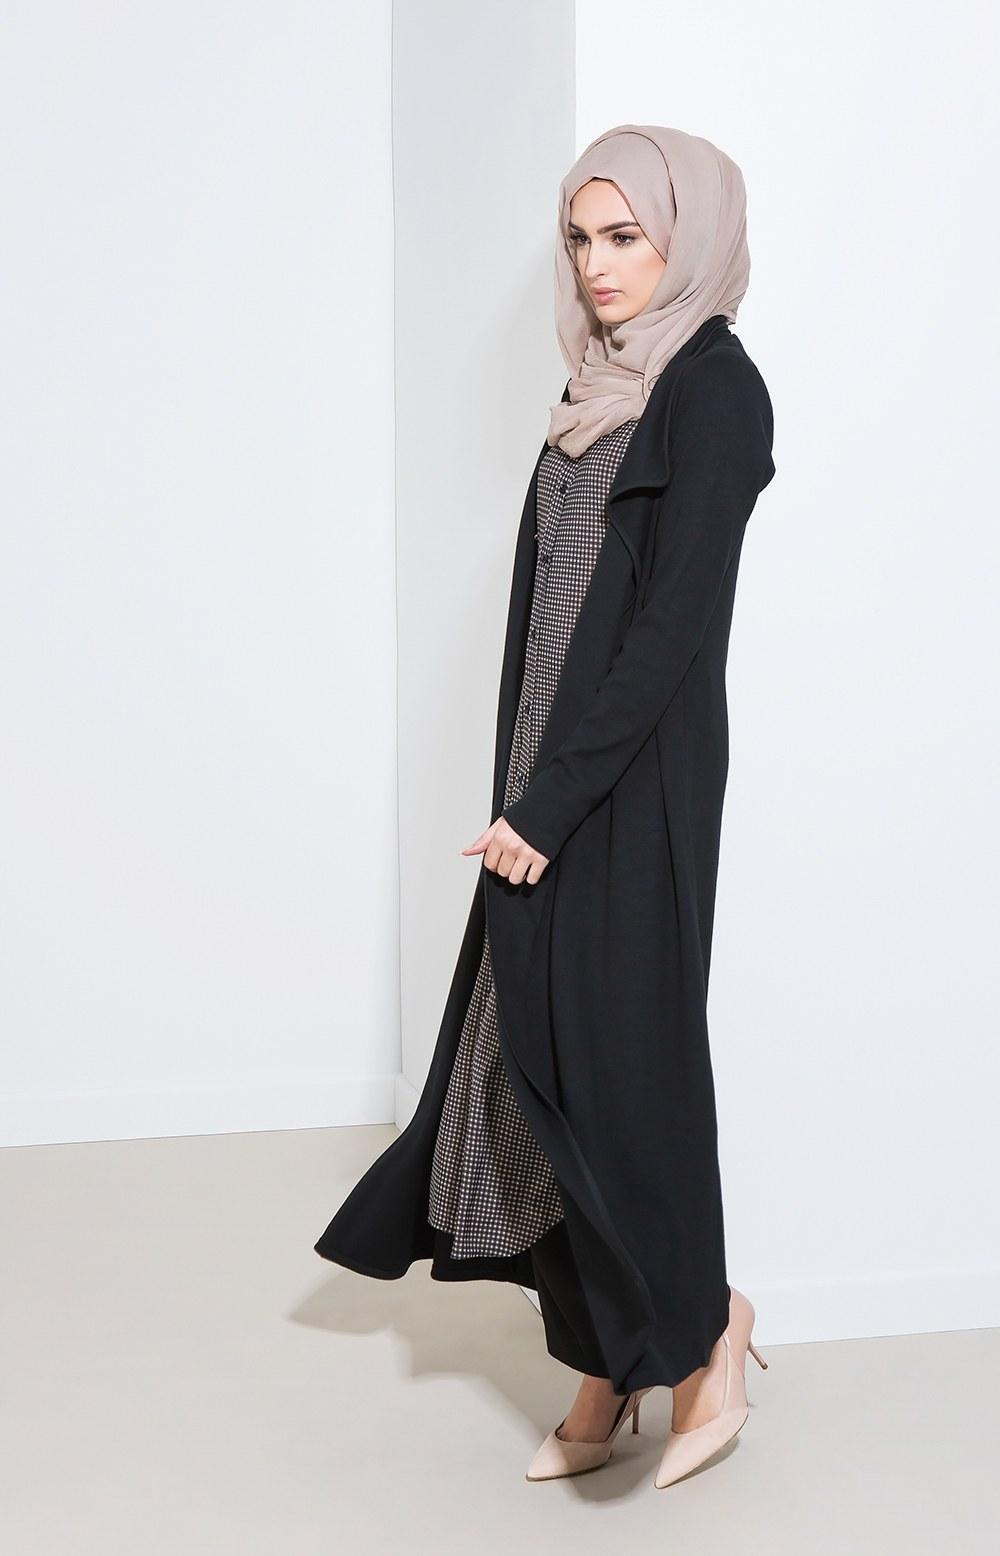 Inspirasi Model Model Baju Lebaran T8dj 25 Trend Model Baju Muslim Lebaran 2018 Simple & Modis